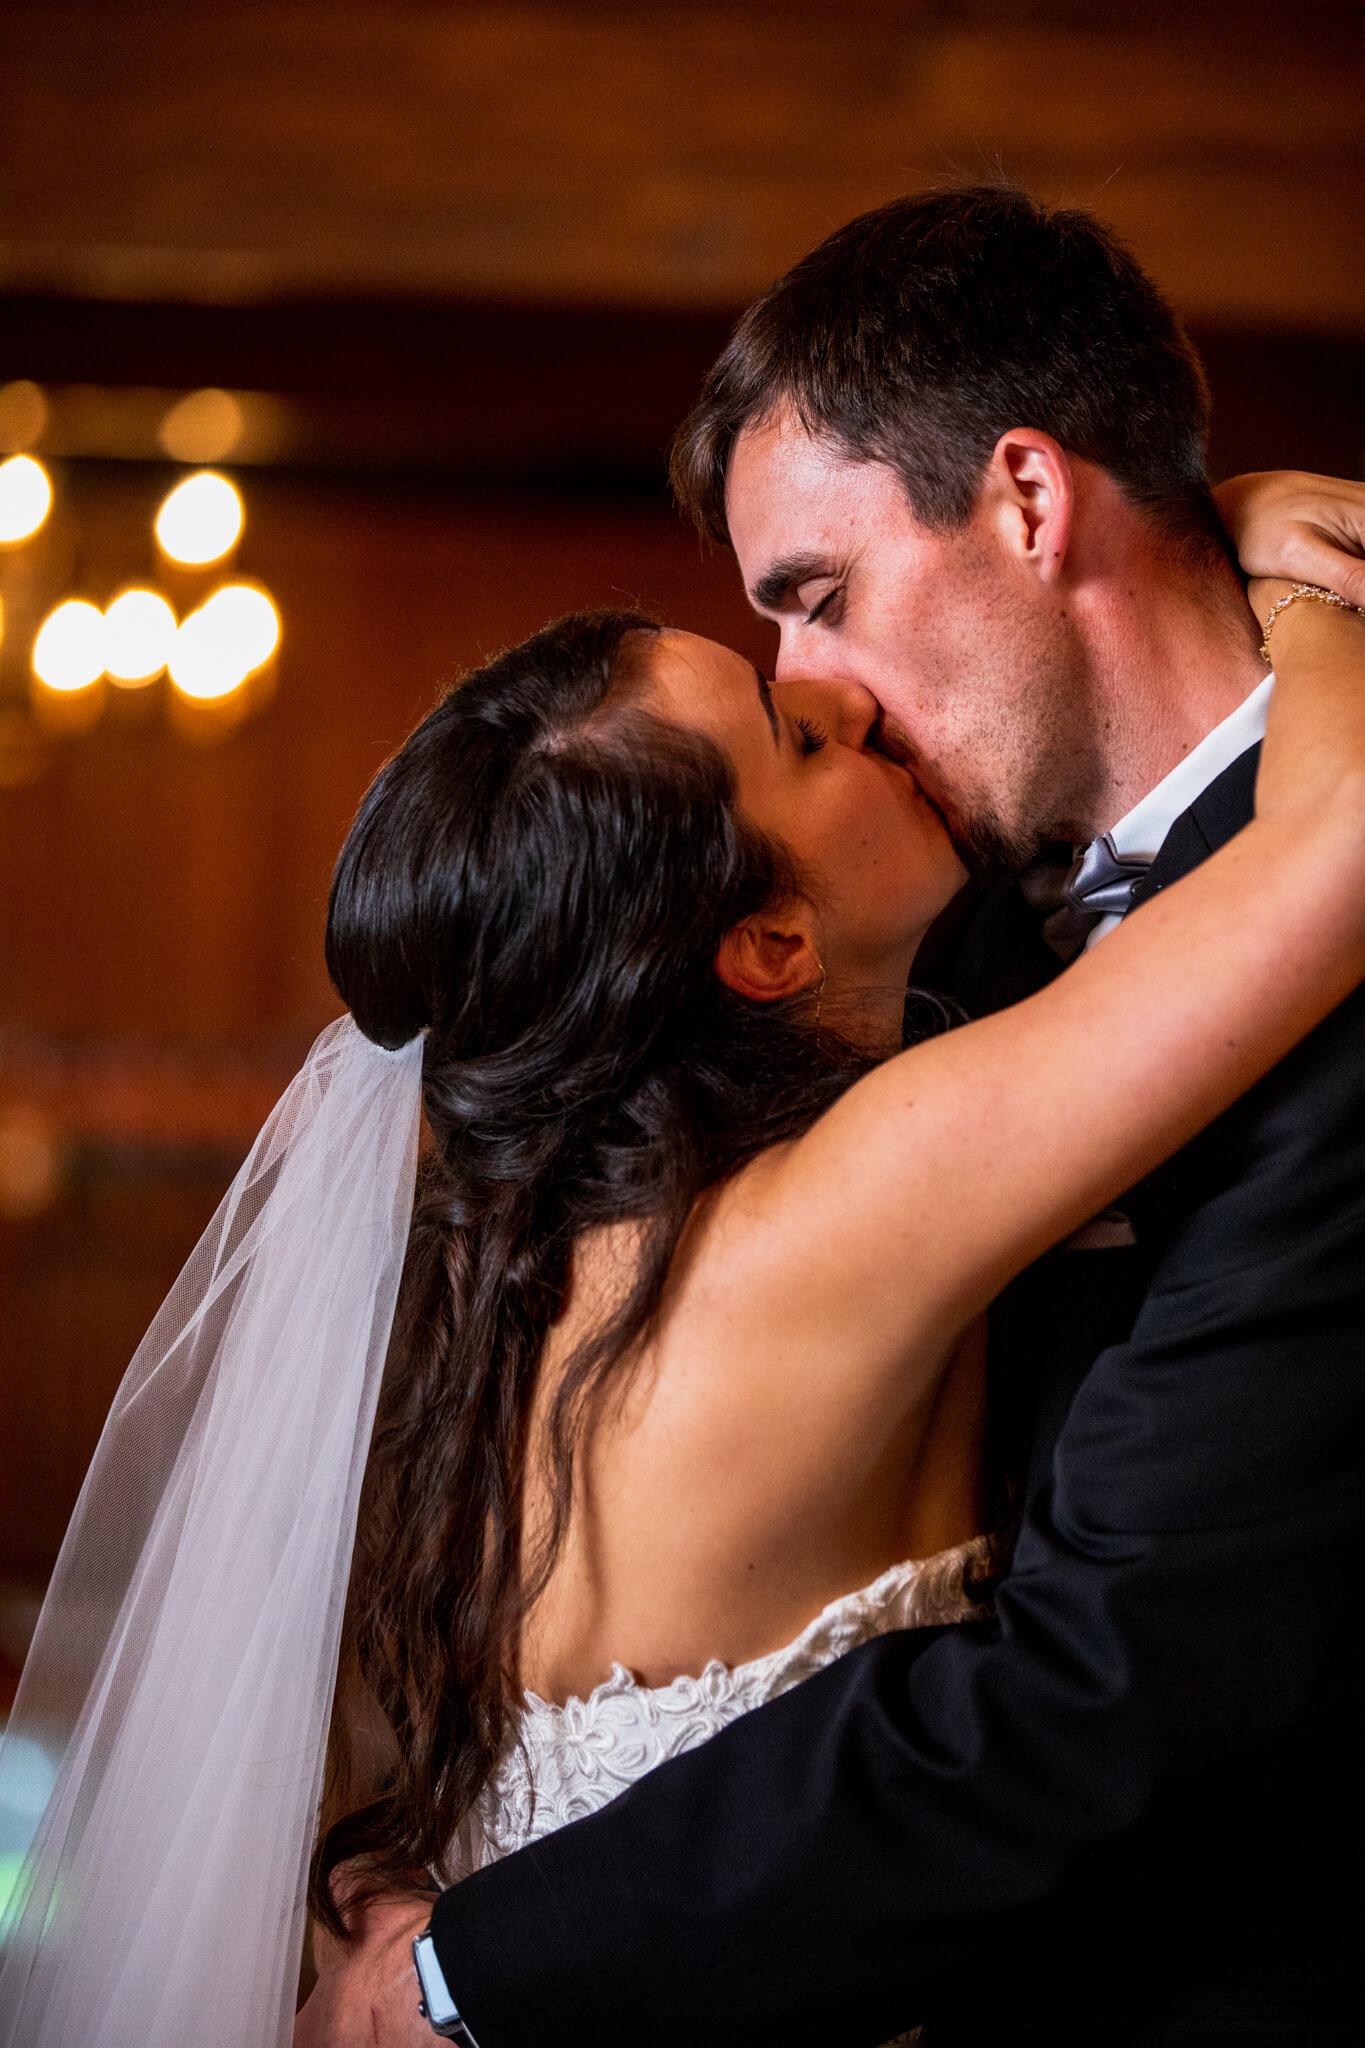 Alysia Jerad Homestead Blessings Farm Hershey PA Wedding Rustic Chique - 84.JPG